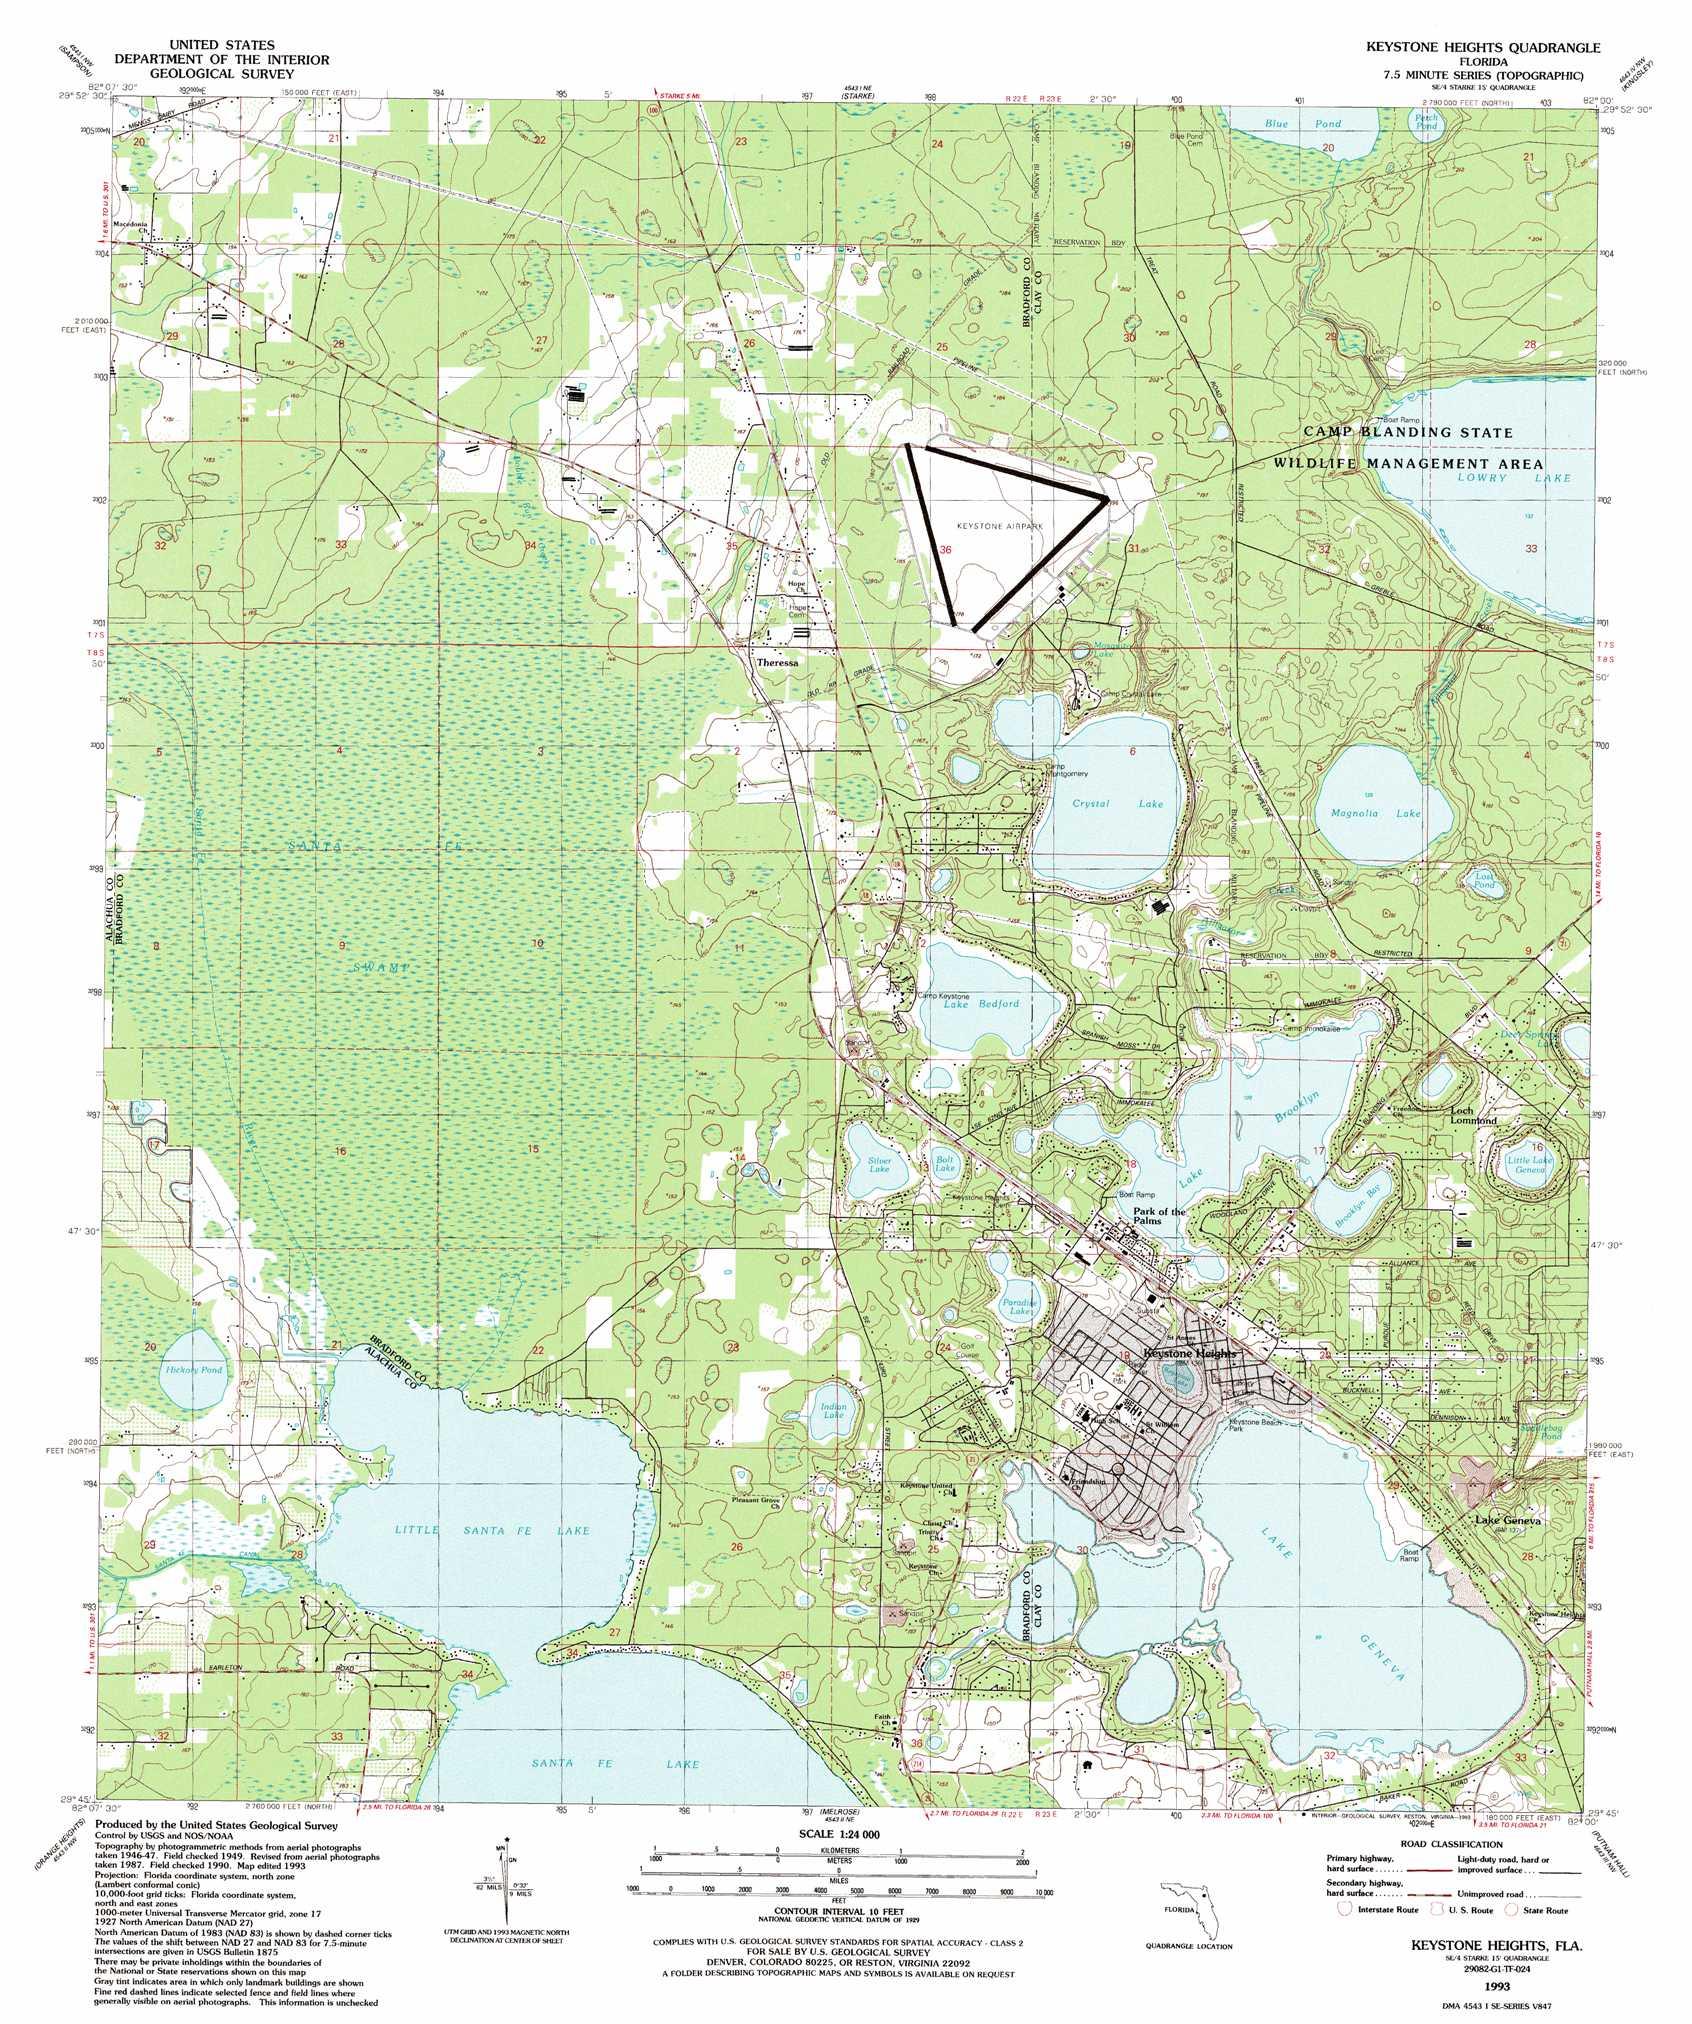 Keystone Heights topographic map, FL - USGS Topo Quad 29082g1